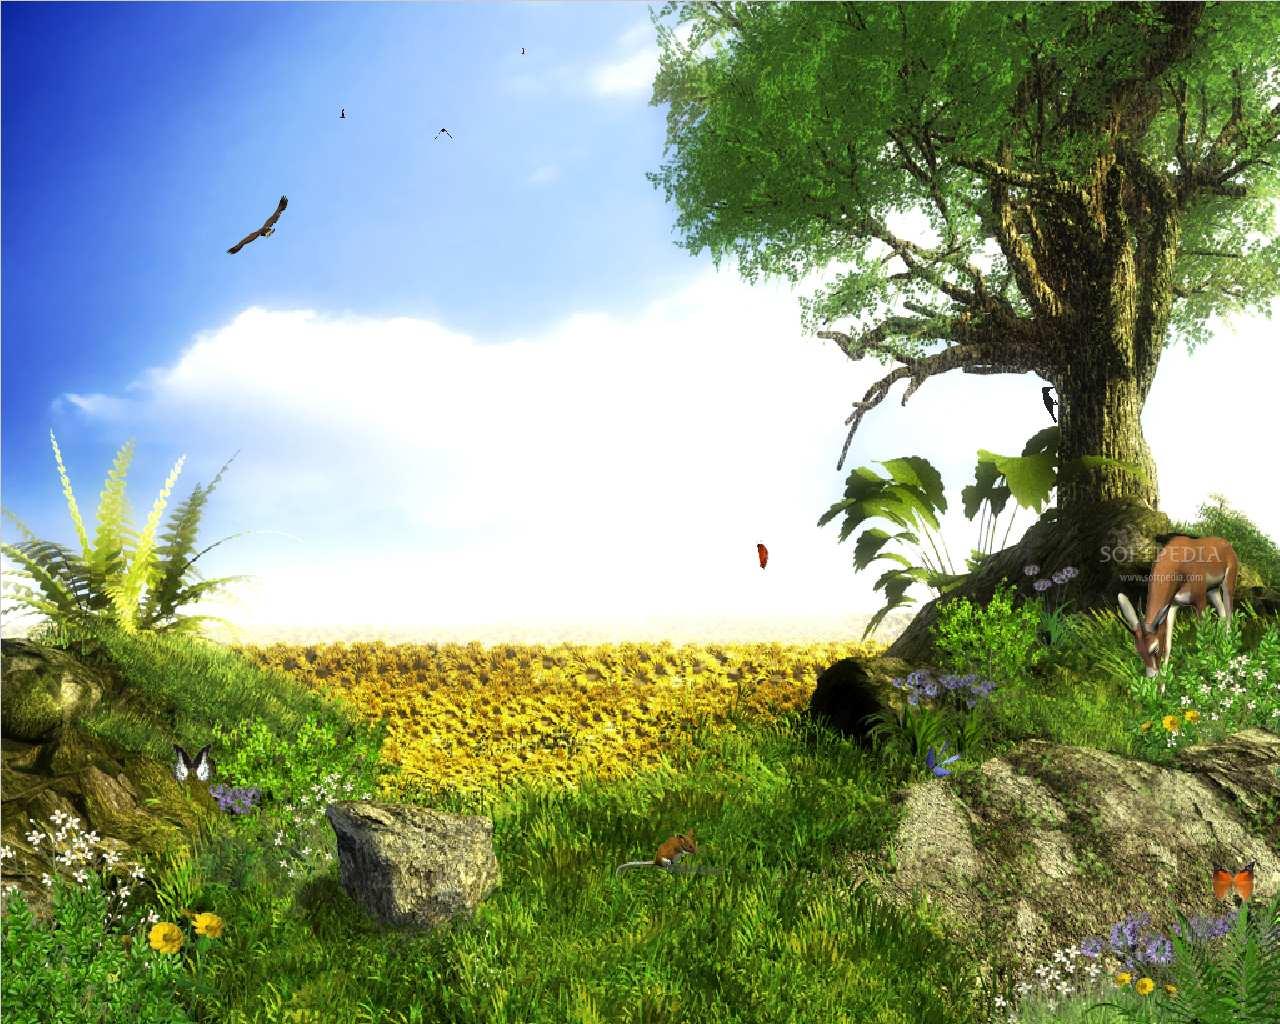 3d Animated Desktop Animated Desktop Wallpaper for Mac 3d 1280x1024